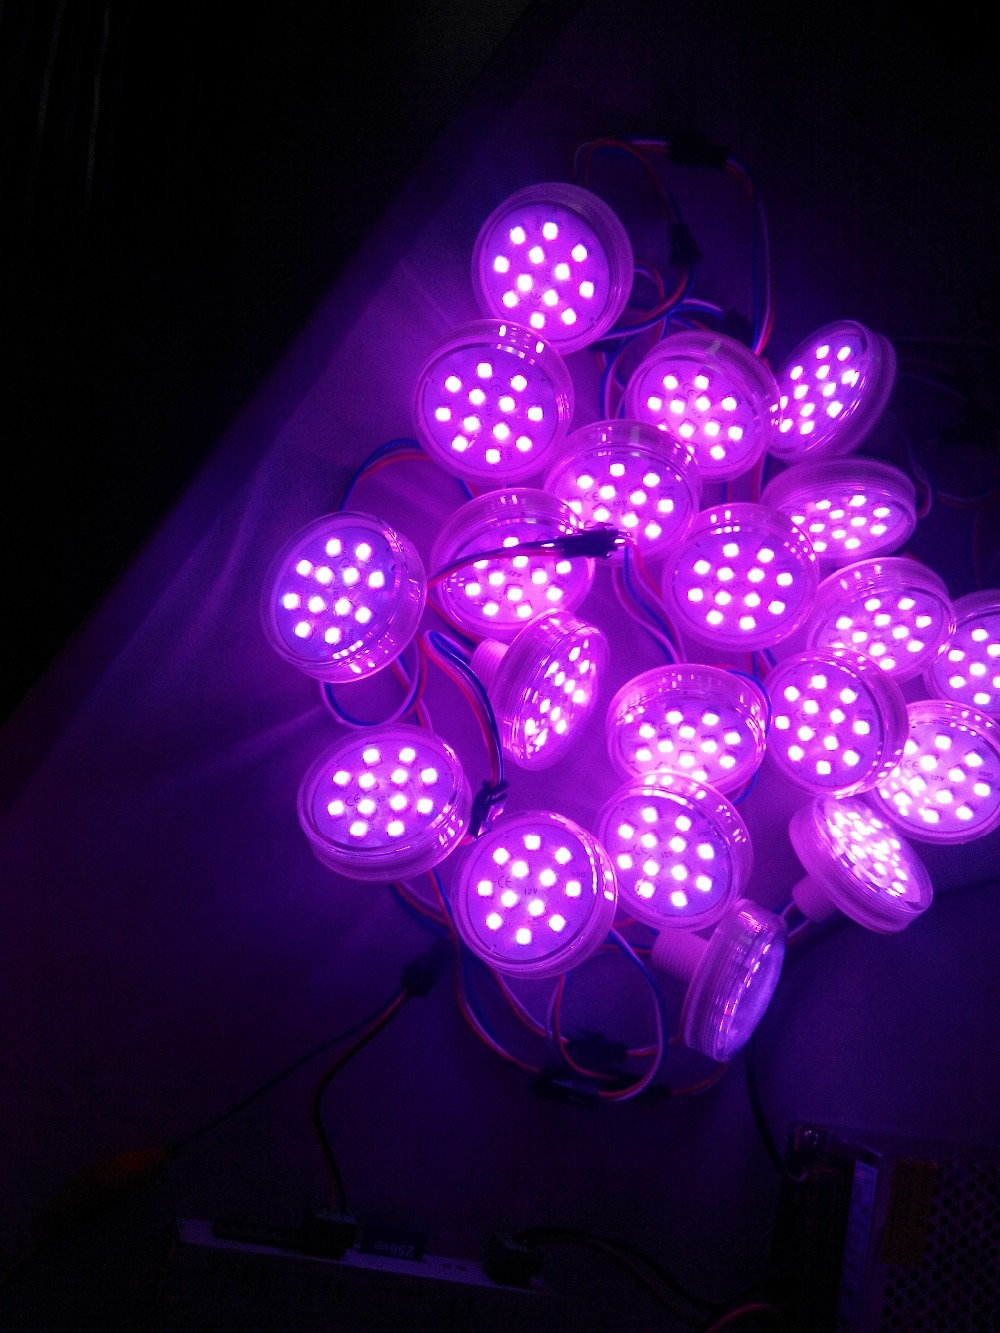 15050 SMD RGB LEDs UCS1903 IC,UCS1903 LED pixel point light, ,module string, DC12V input, - SCOTT Store store